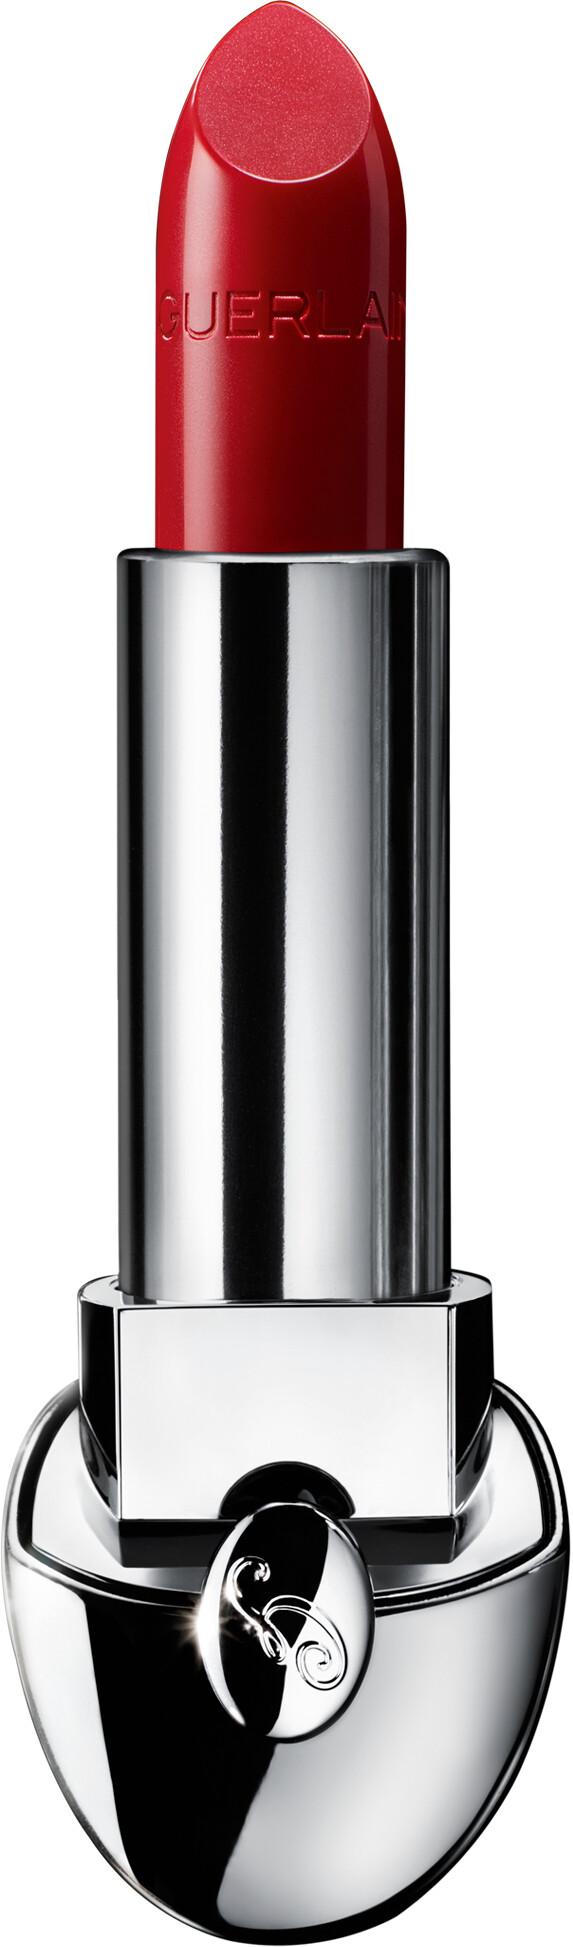 GUERLAIN Rouge G Lipstick Refill